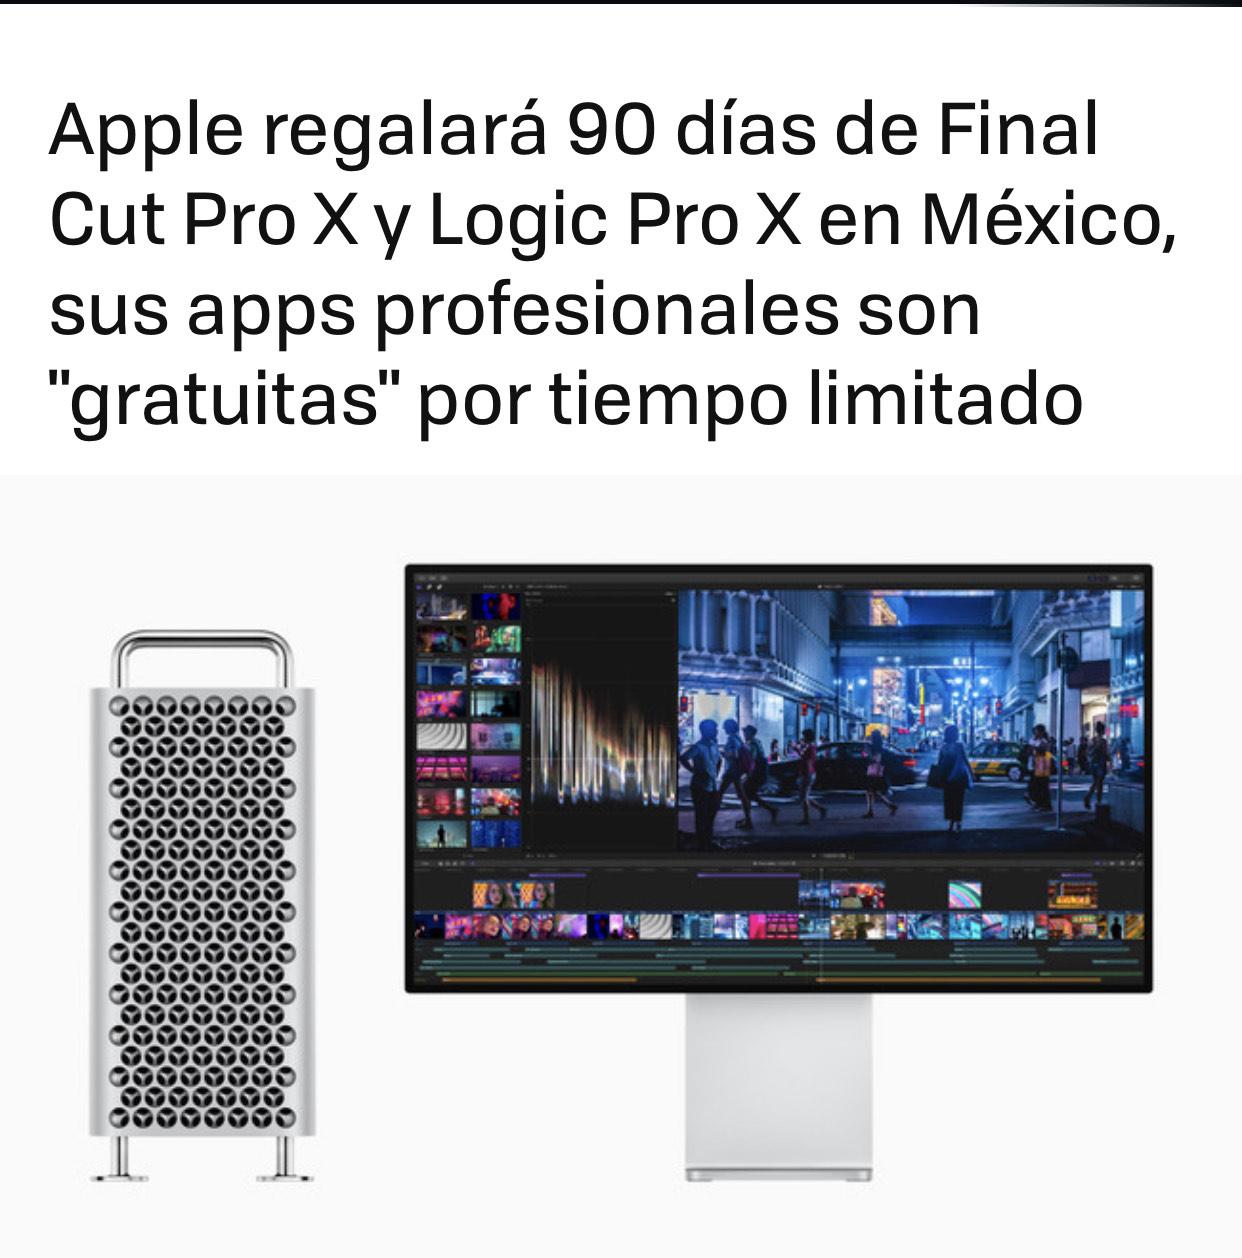 Final Cut Pro X: Prueba gratuita de 90 días